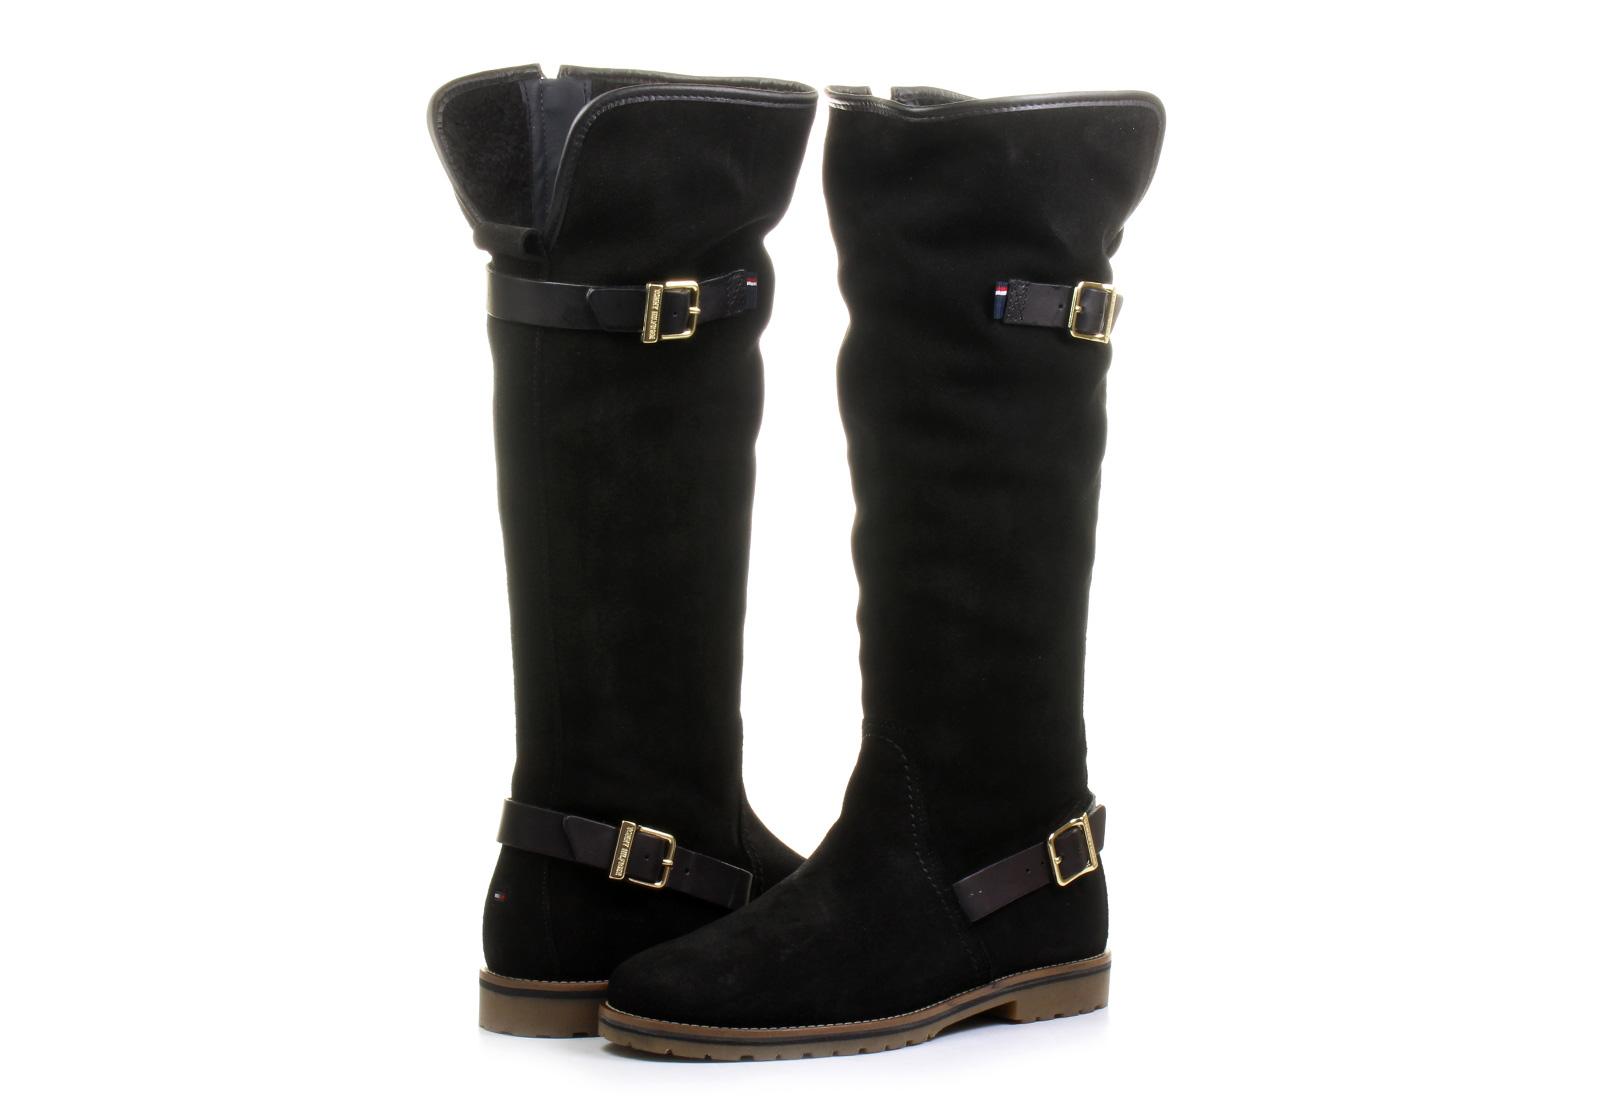 Tommy Hilfiger Csizma - Wendy 1bw - 15F-0016-990 - Office Shoes  Magyarország Skechers Csizma - Boot High ... ed031694ff